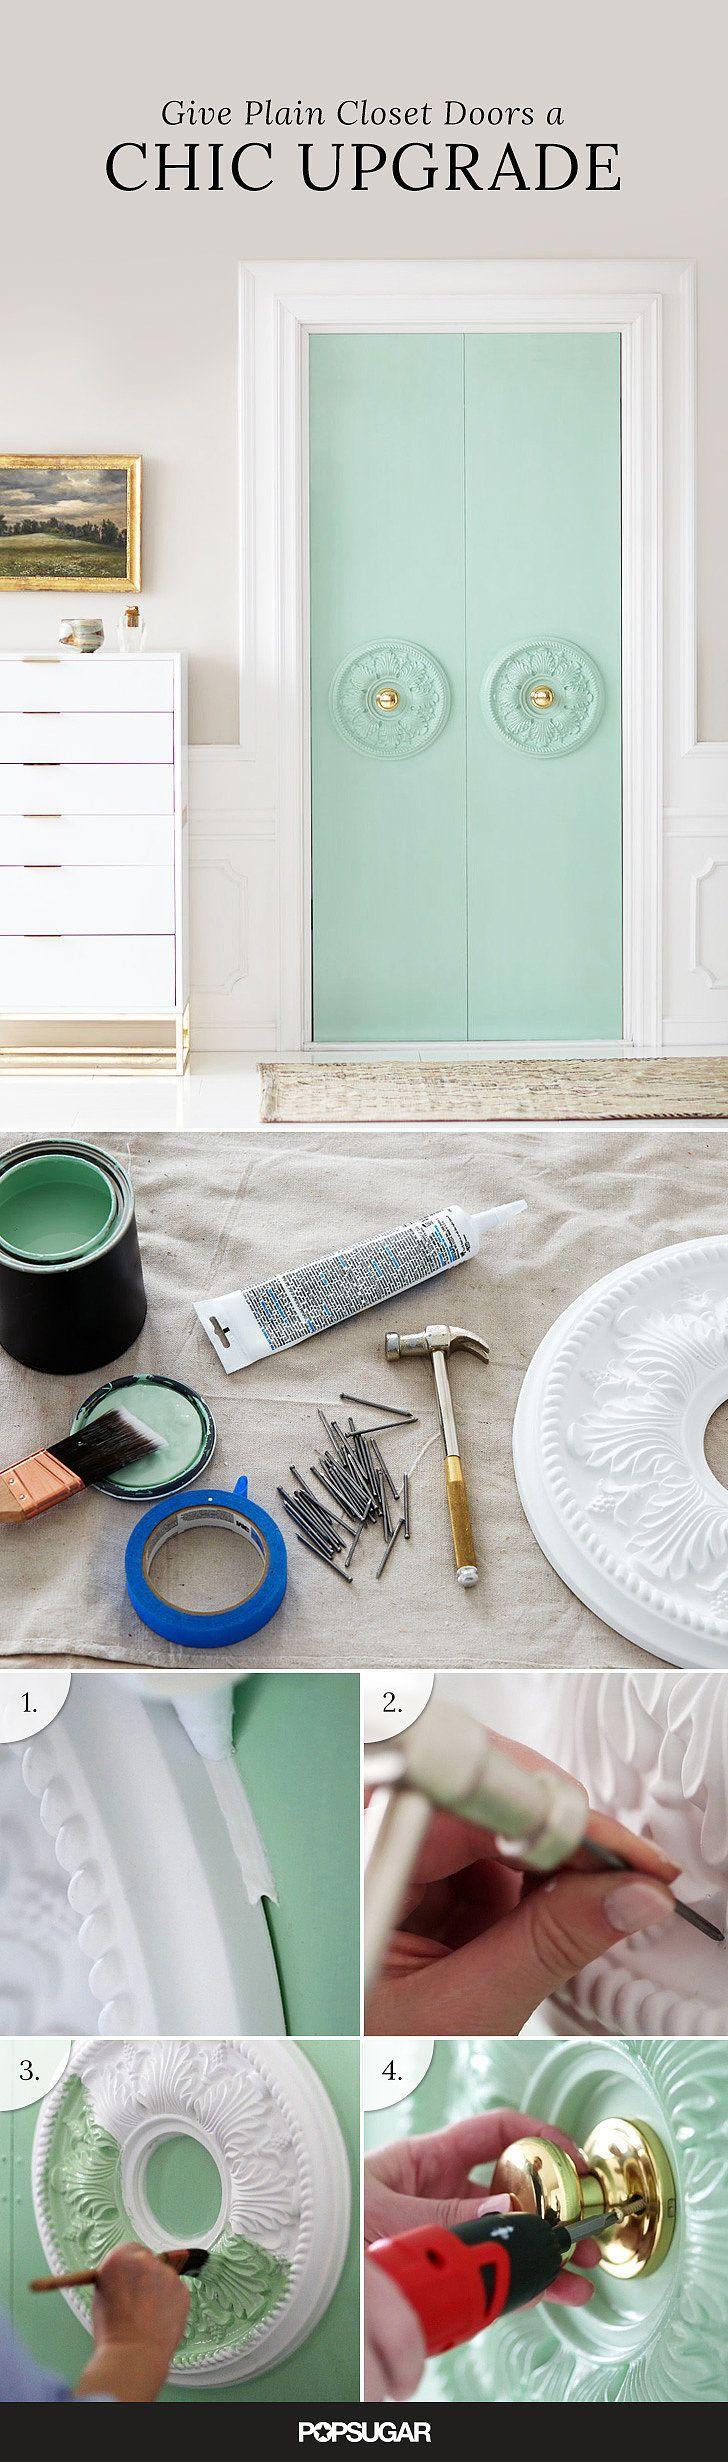 The Clever DIY That Makes Plain Closet Doors Look Like a Million Bucks